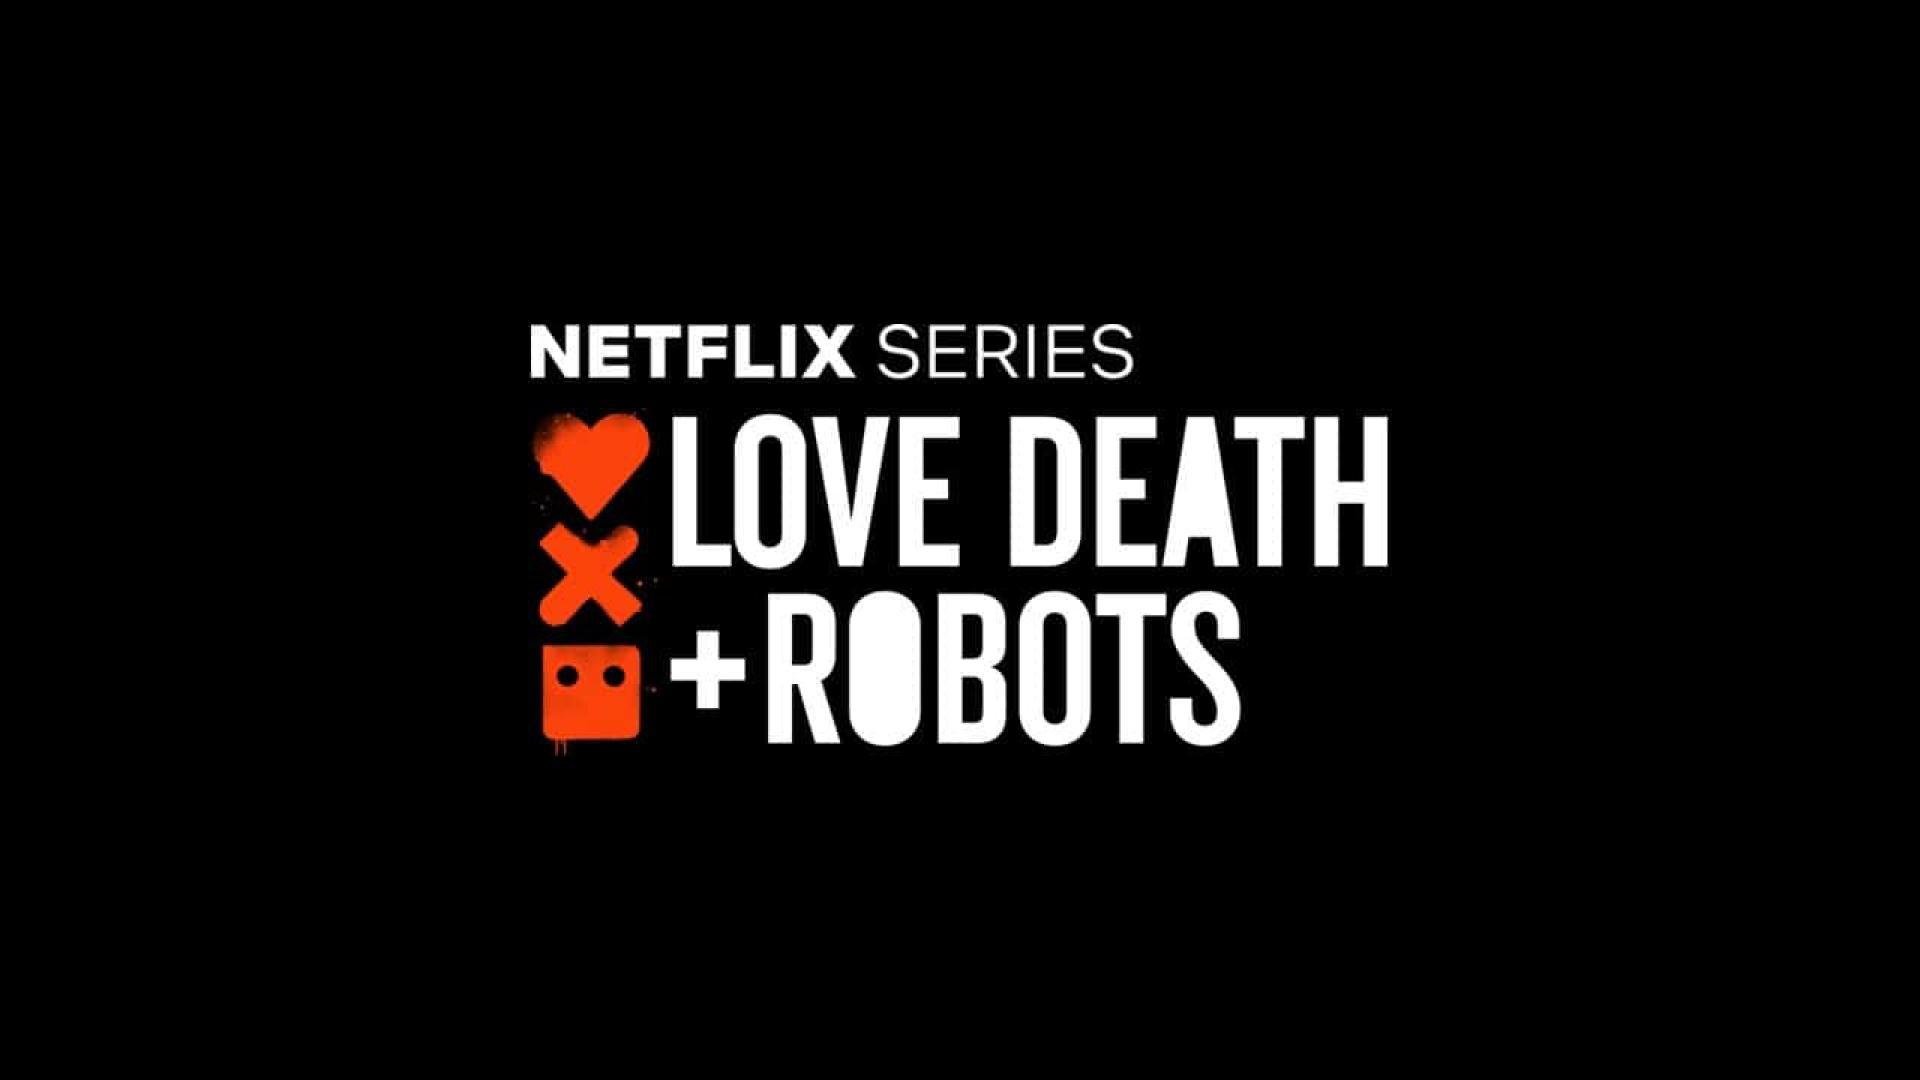 Love Death & Robots (2019)